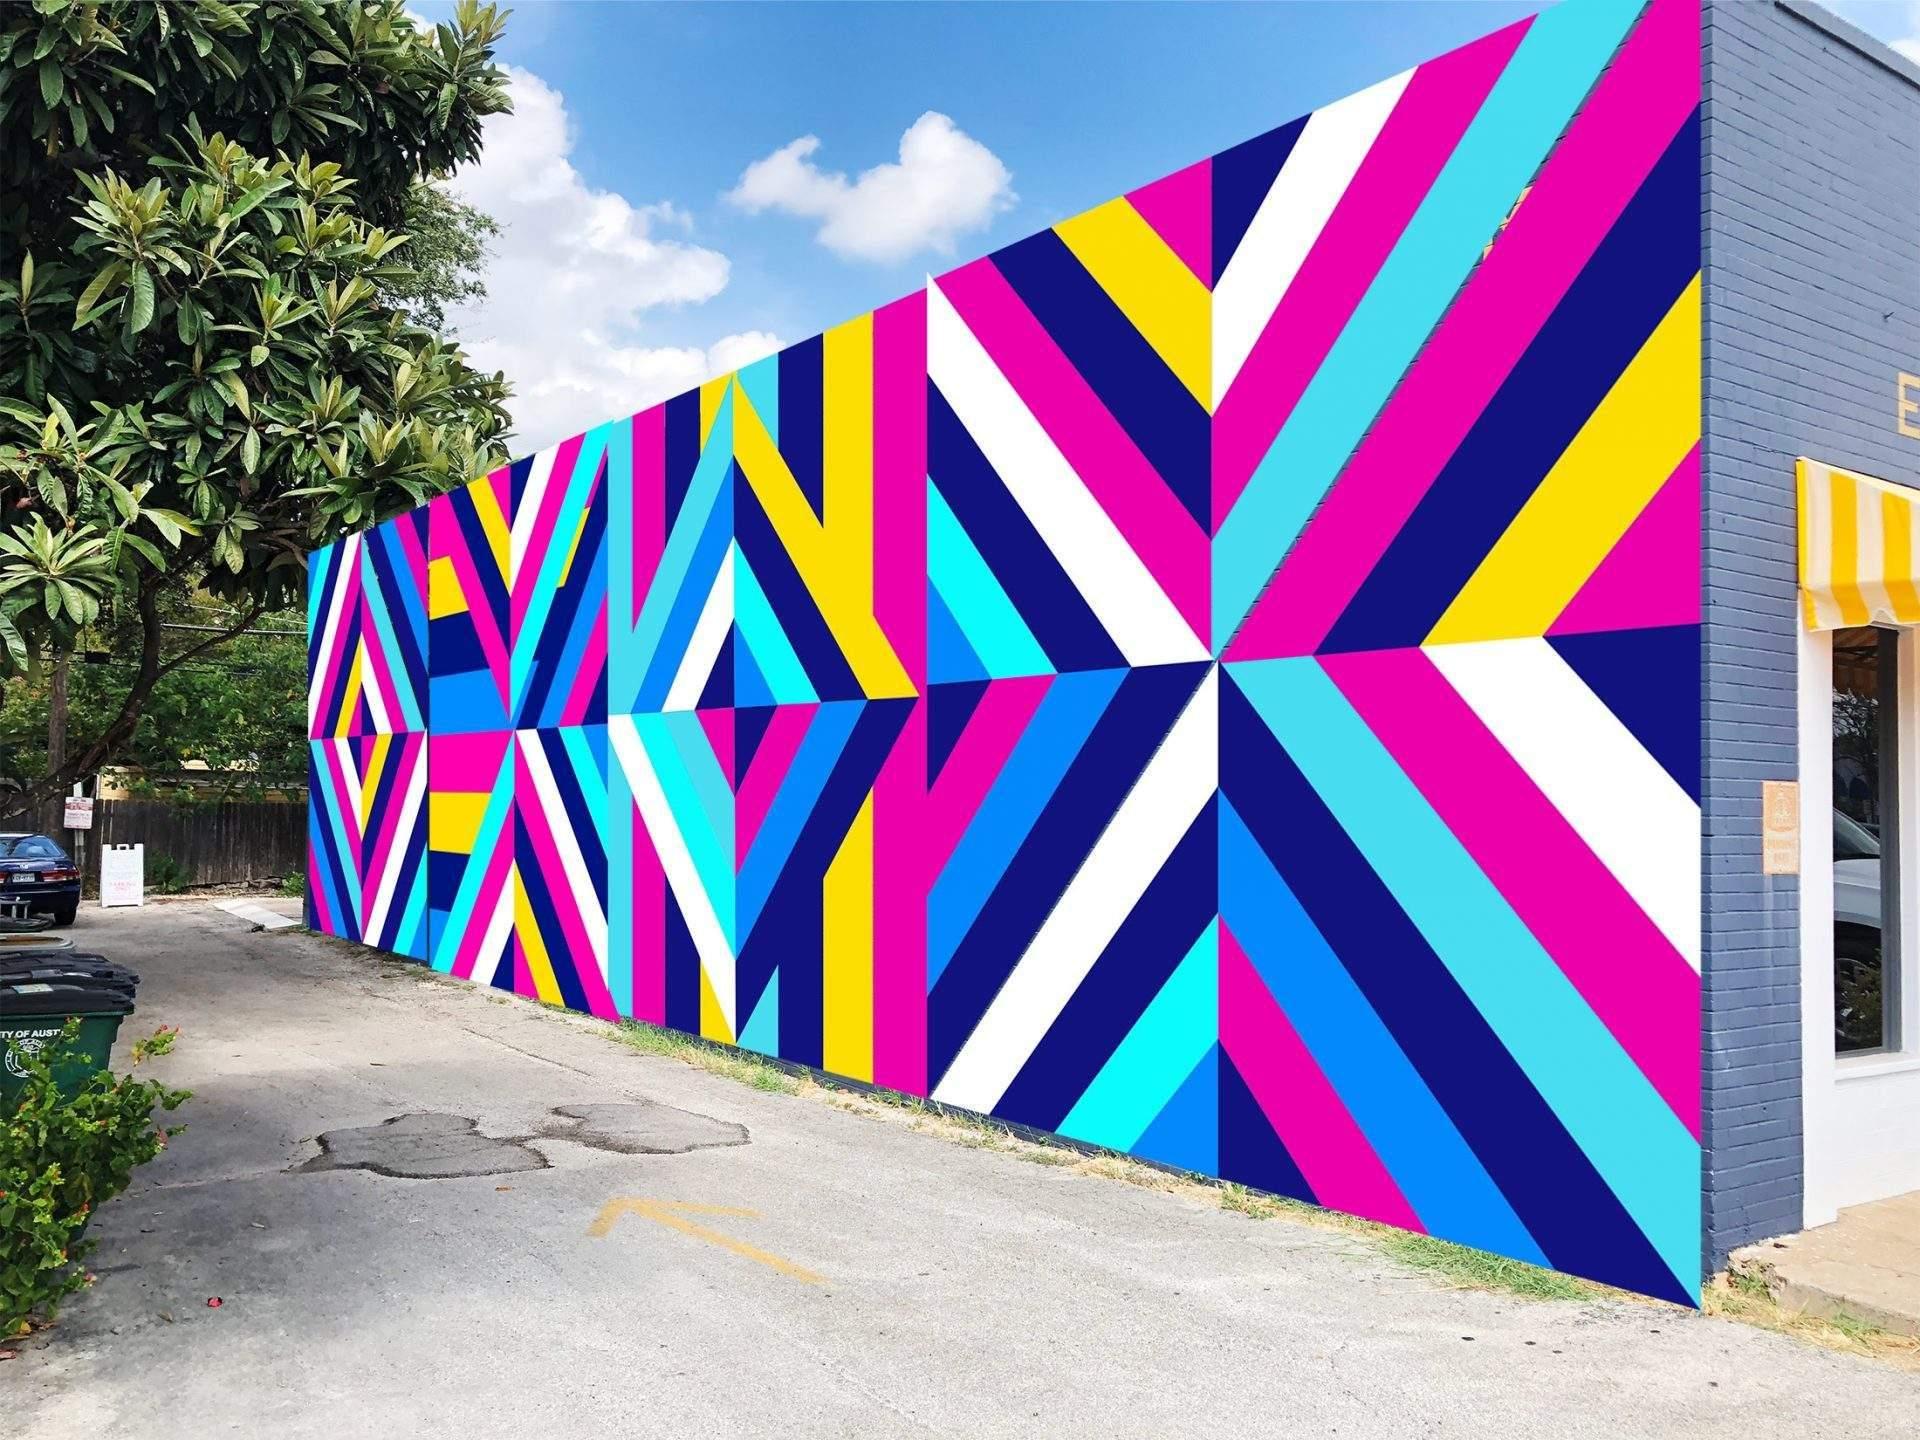 design austin | geometric mural on building | austin, texas